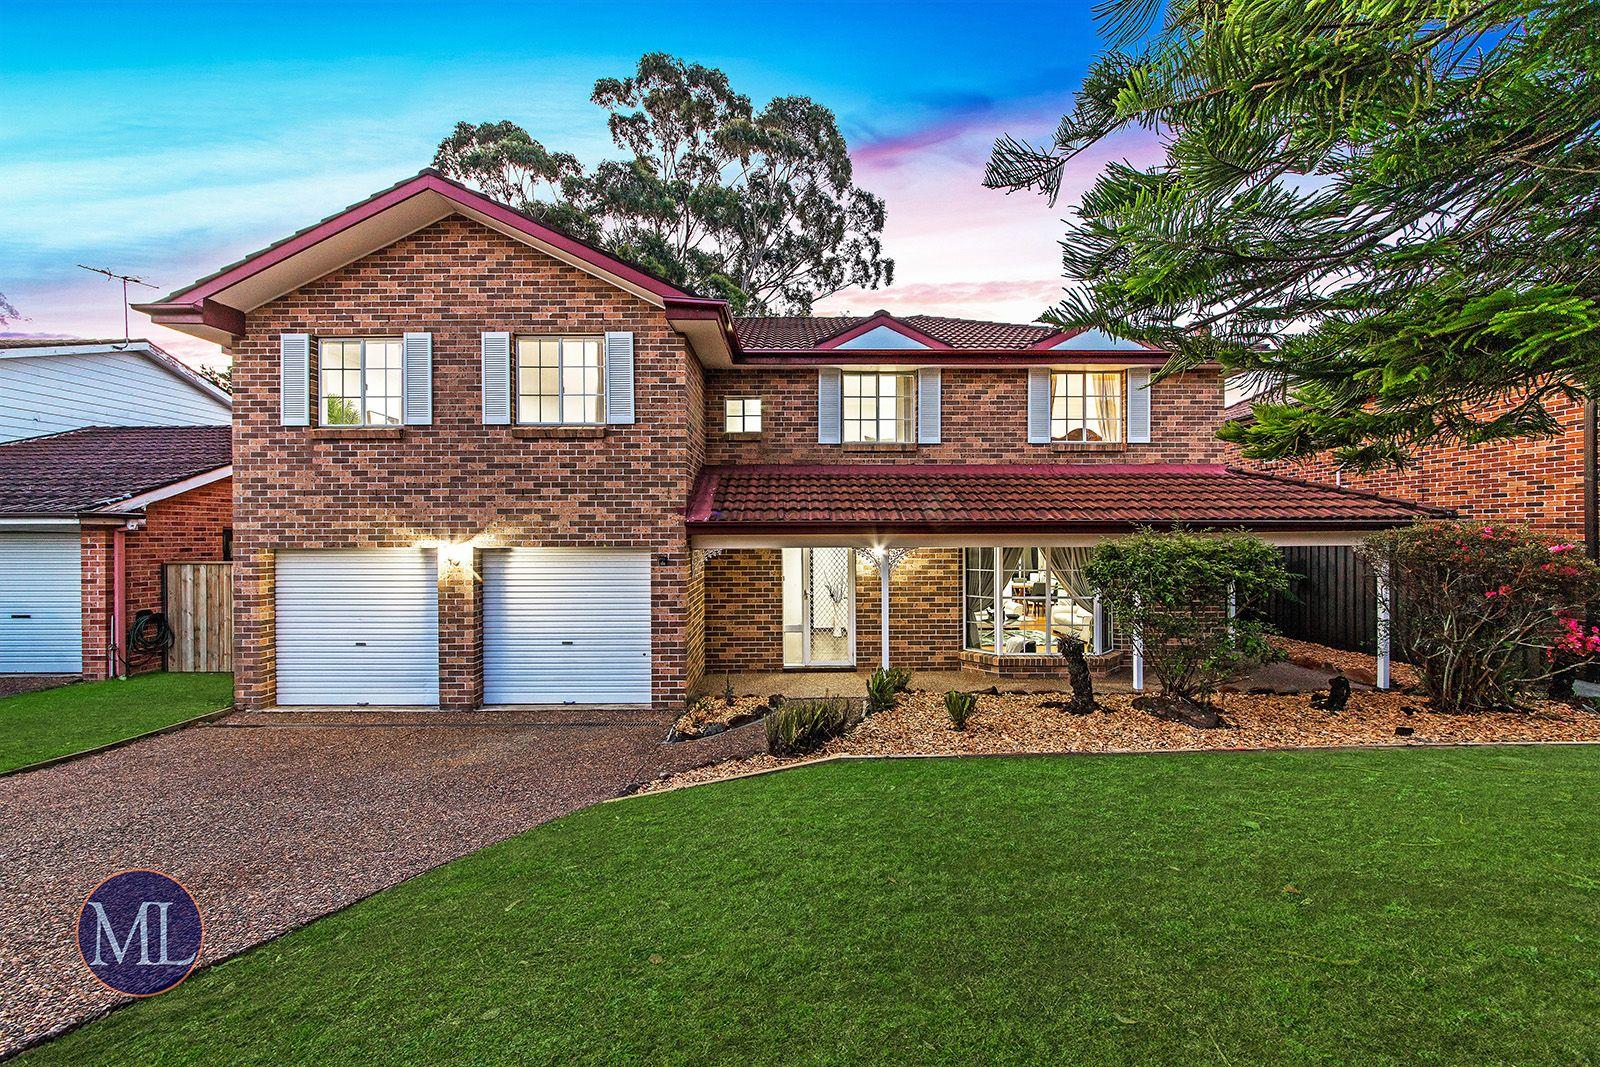 193 Purchase Road, Cherrybrook NSW 2126, Image 0